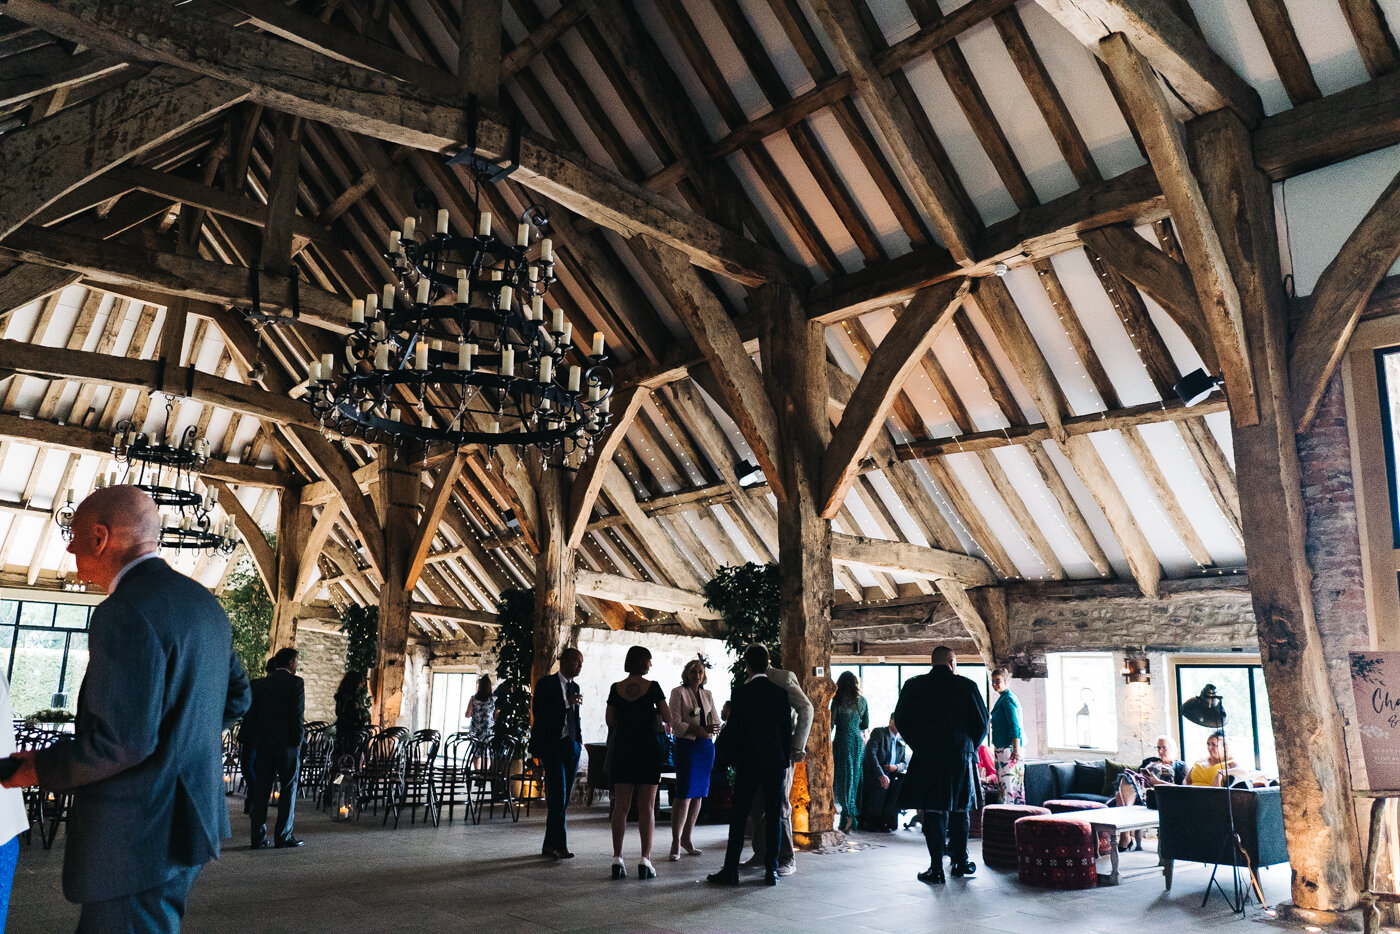 tithe-barn-bolton-abbey-north-yorkshire-cripps-wedding-photographer-creative-0013.jpg